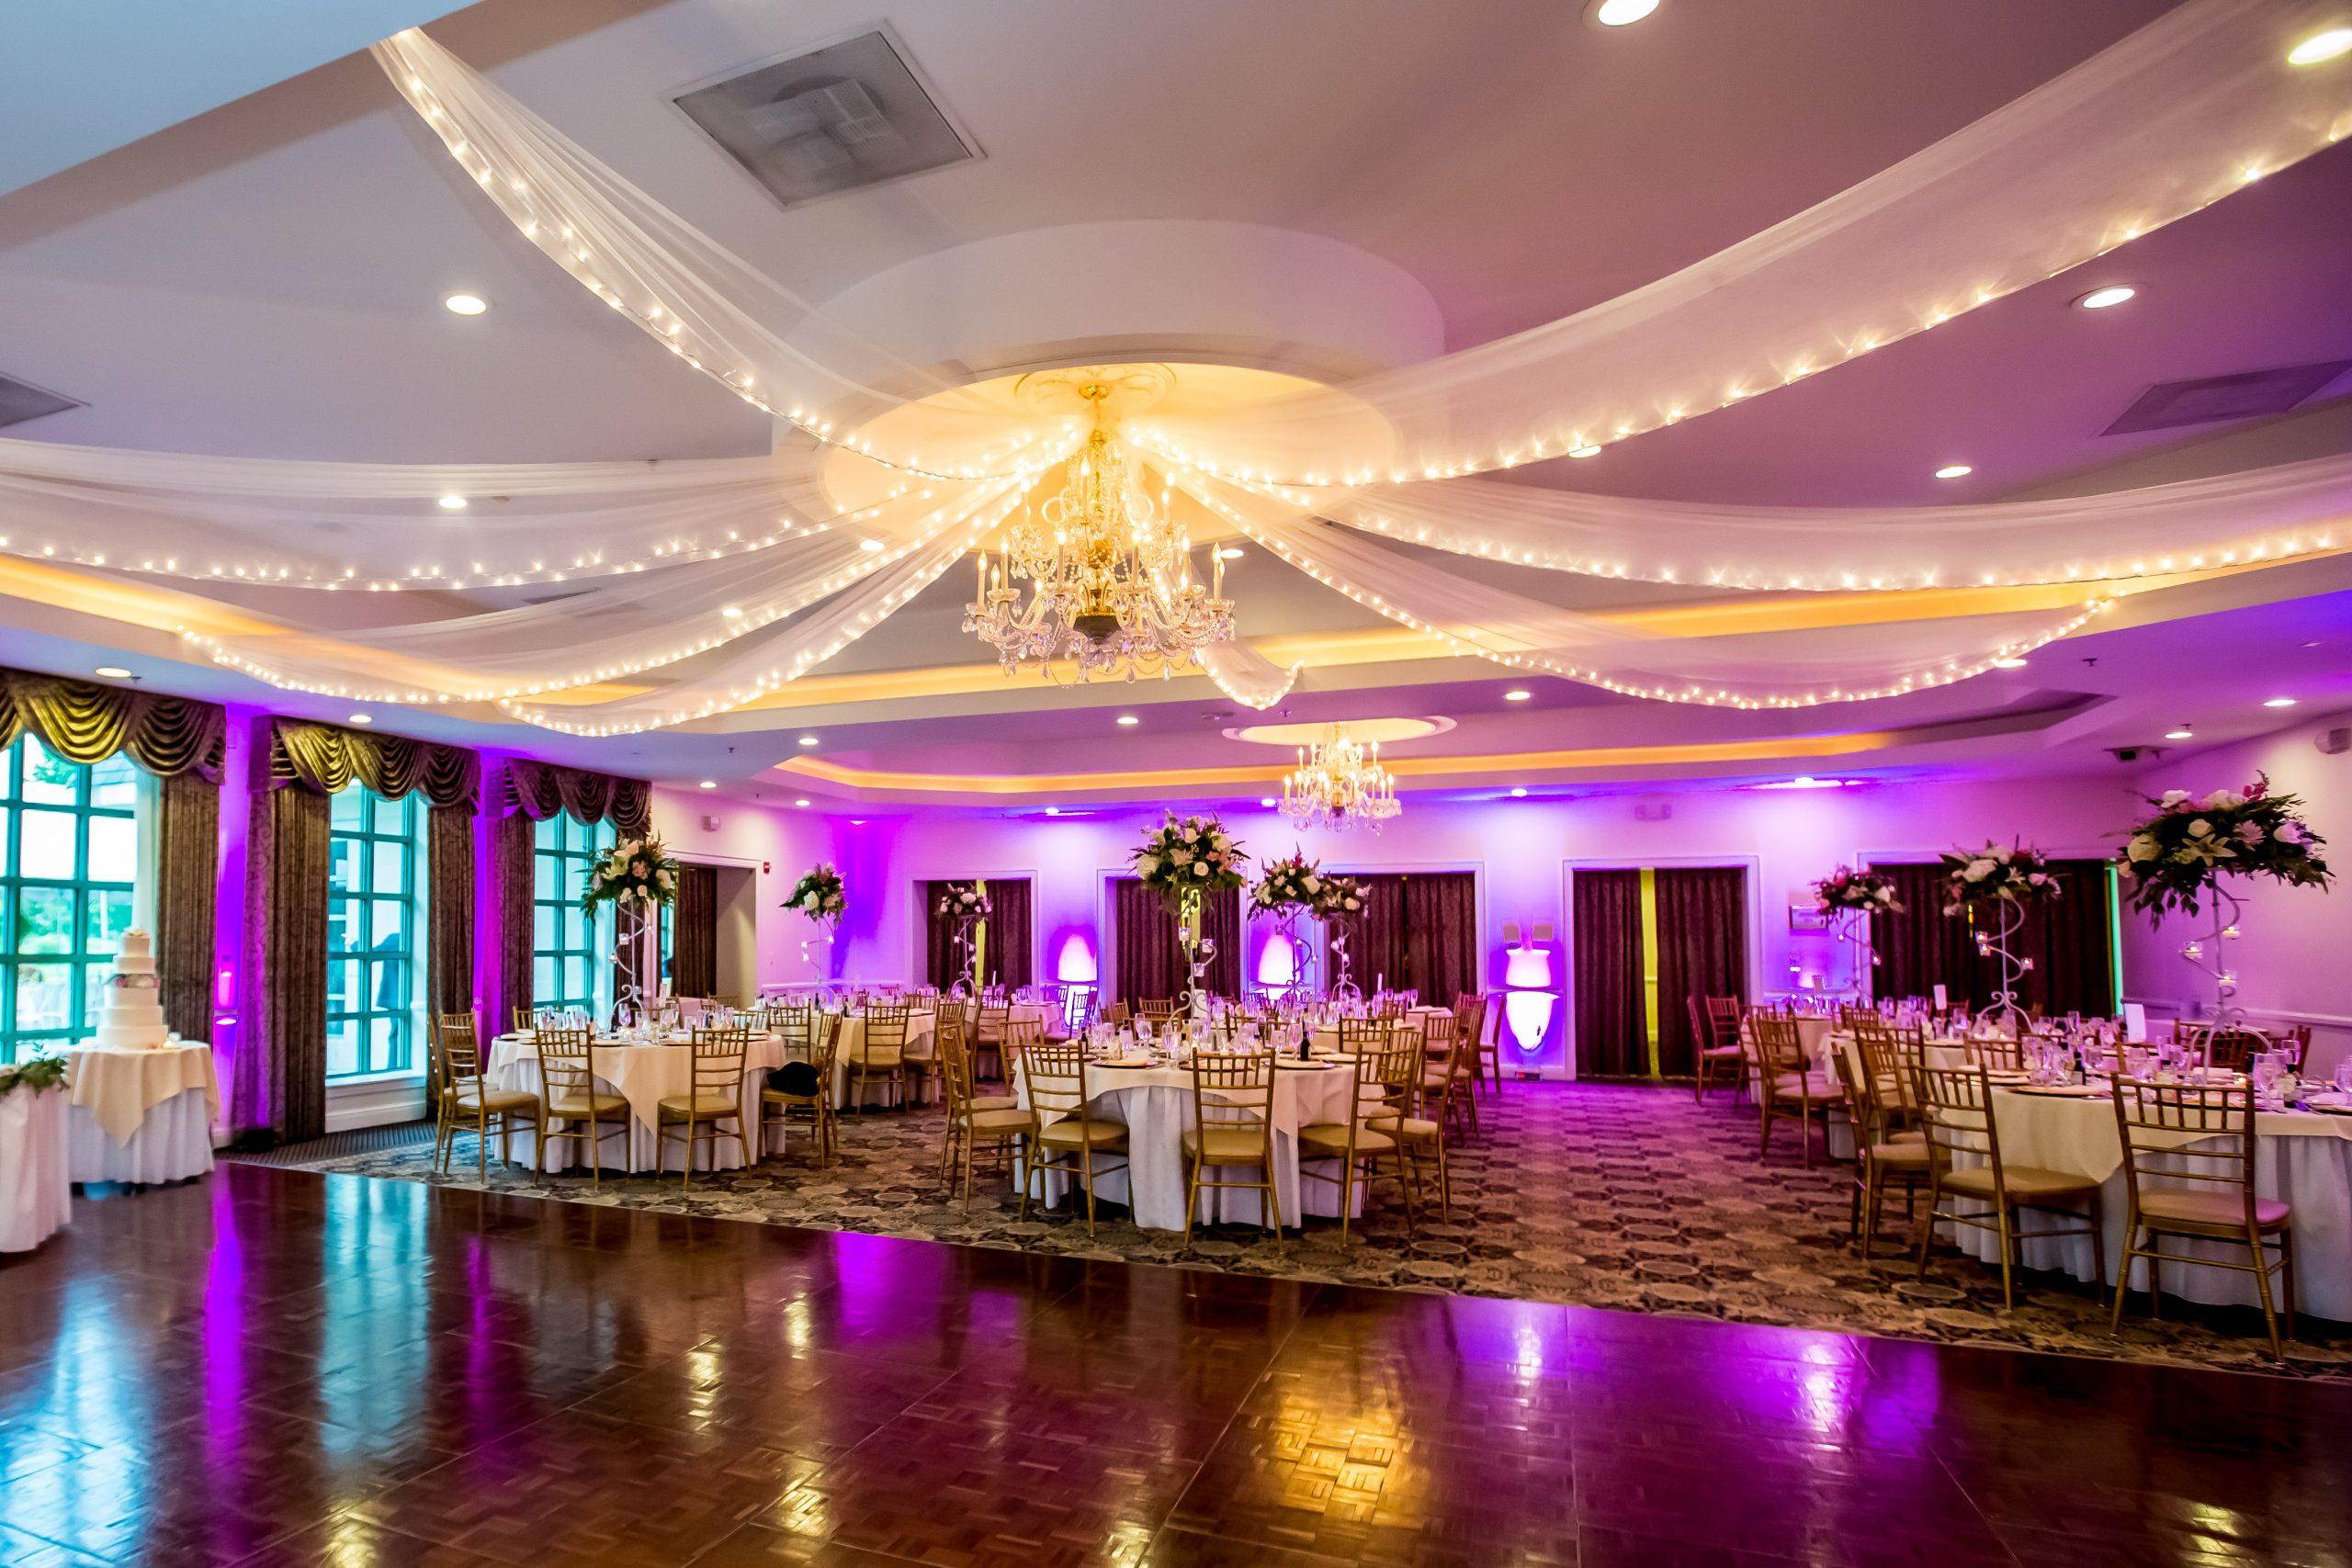 Victori_Rob_Mohawk River Country Club Wedding-46.jpg